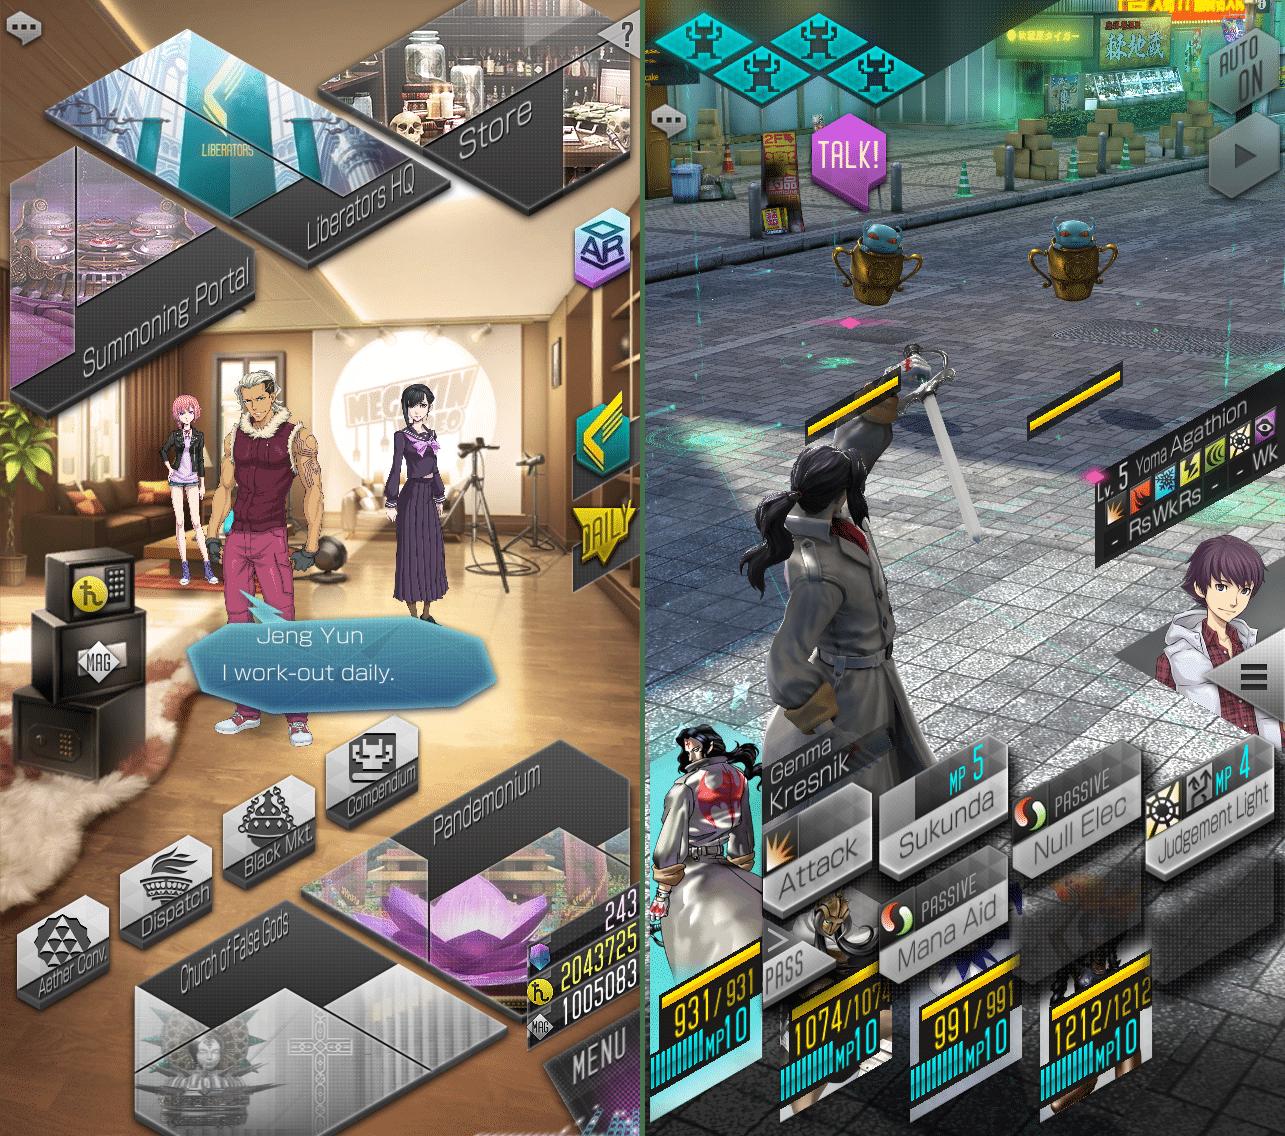 Shin Megami Tensei Liberation Dx2 – SEGA launches new mobile RPG